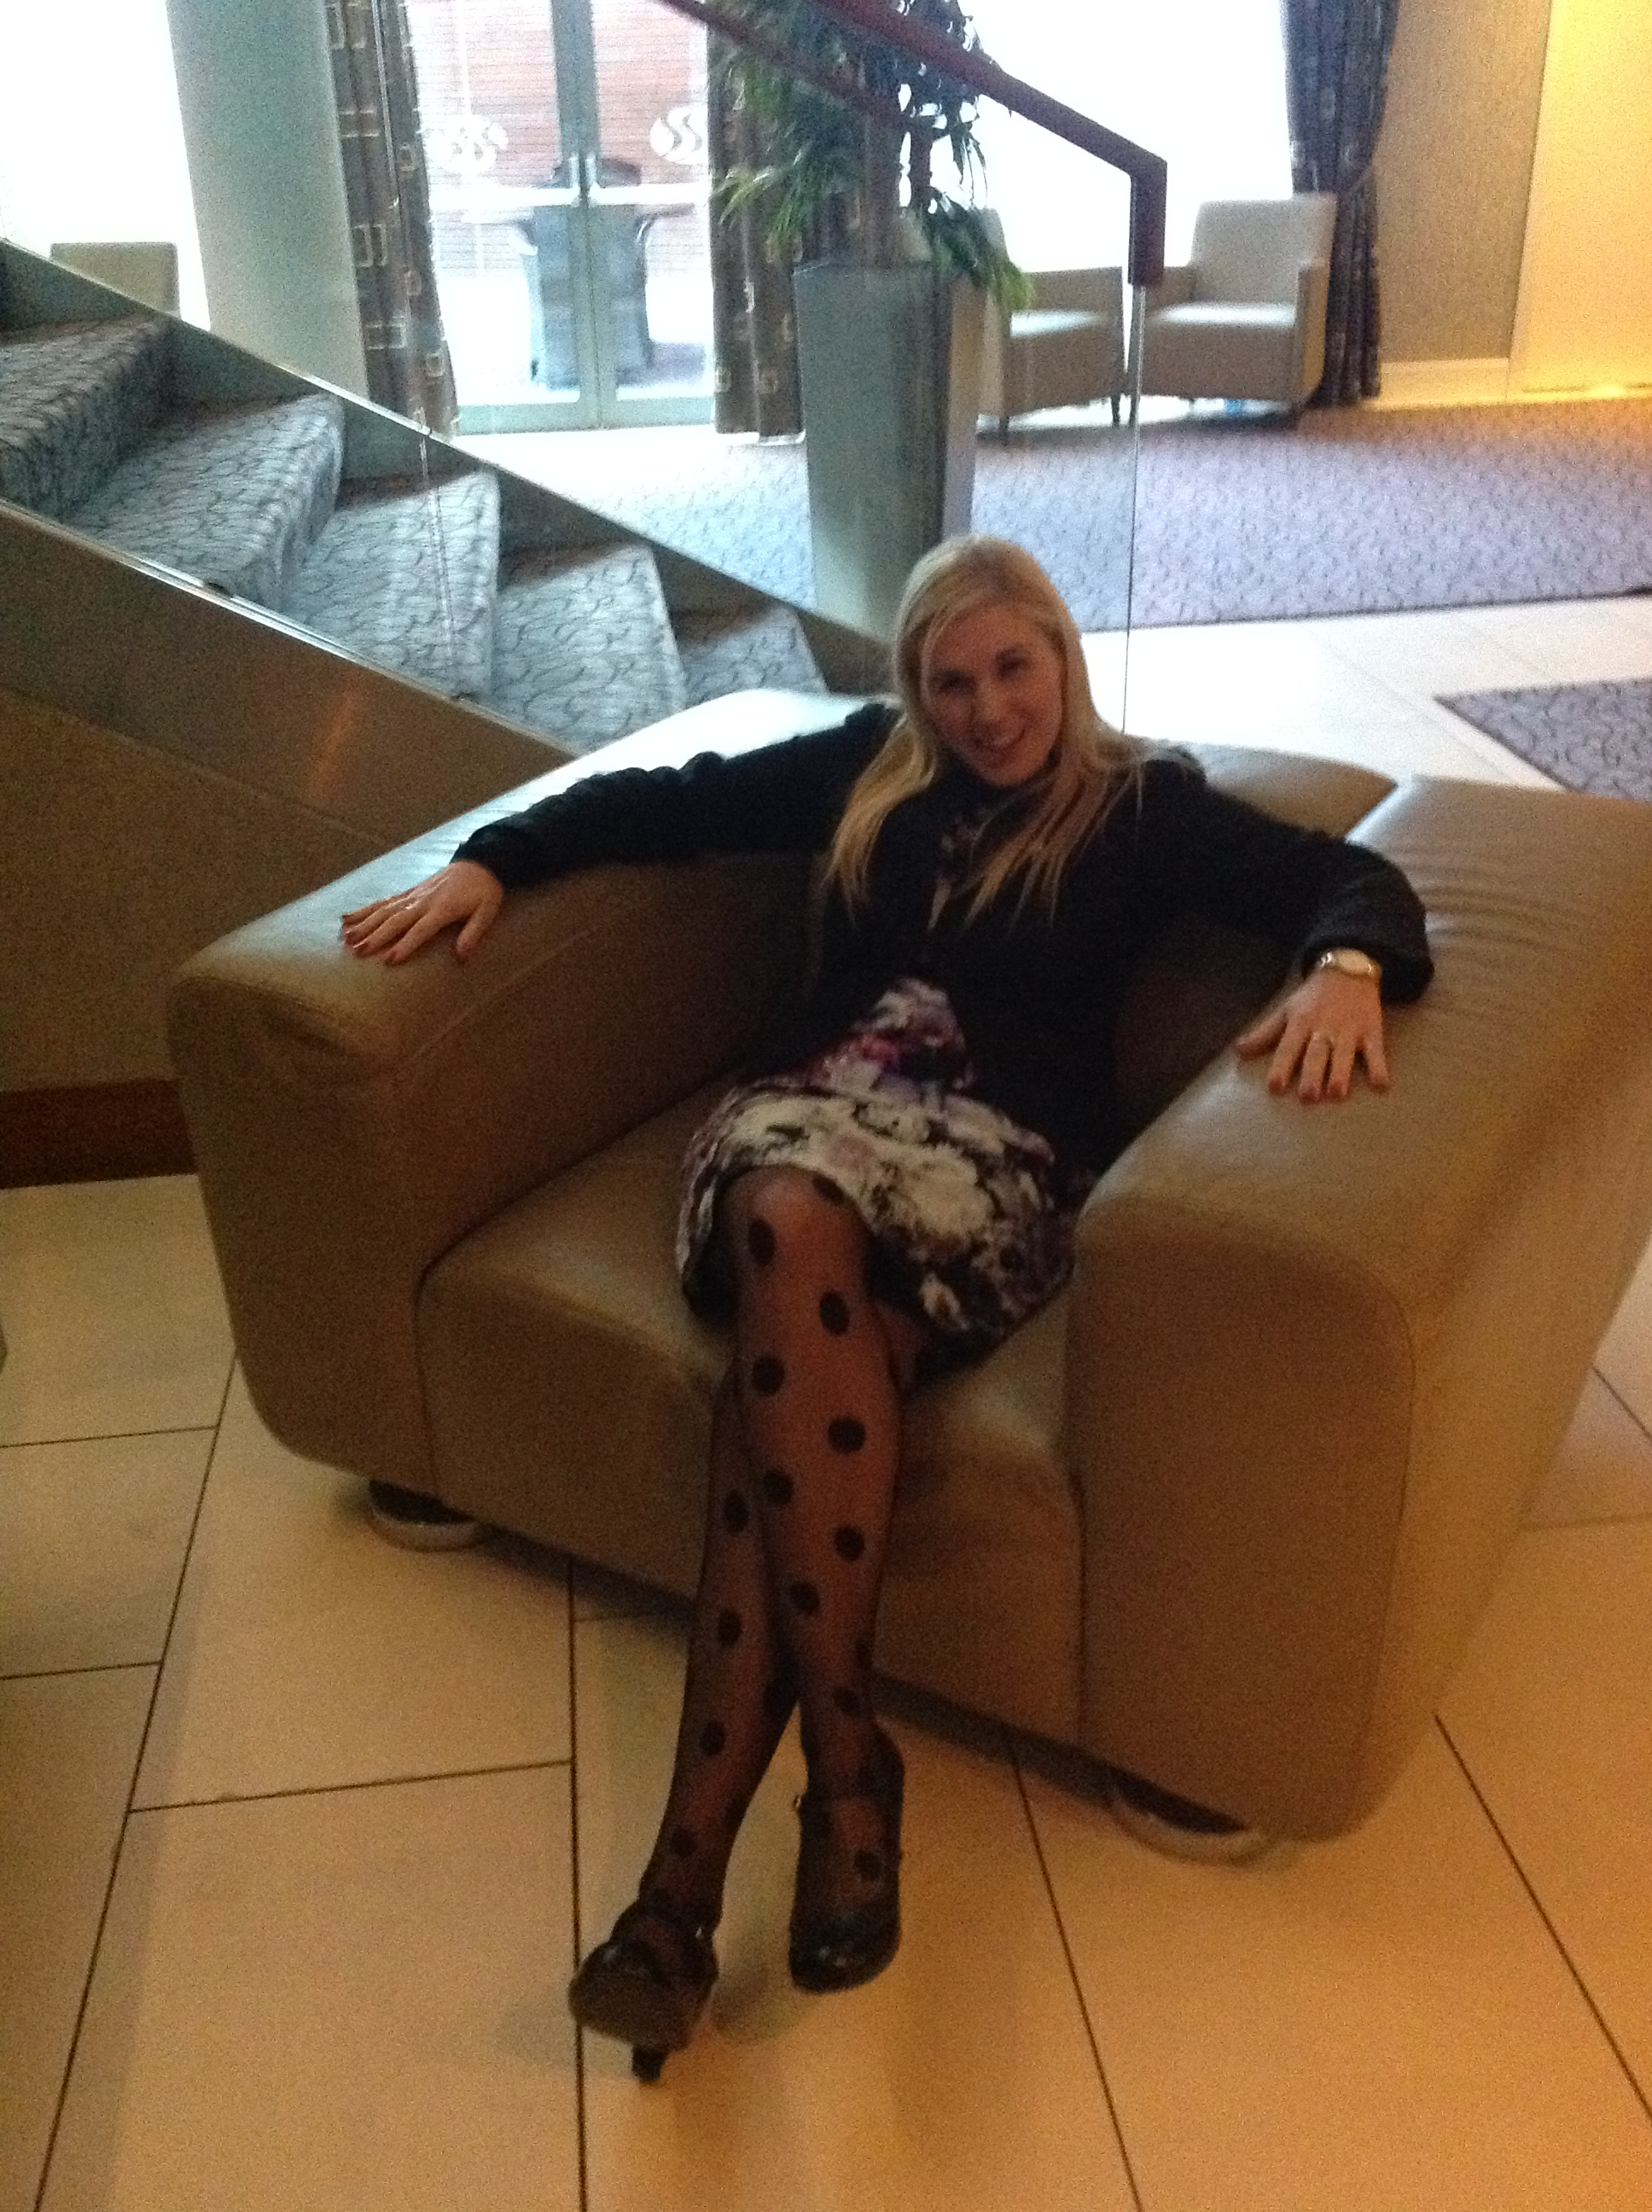 22.11.2012 Sinead, Strand Hotel Limerick